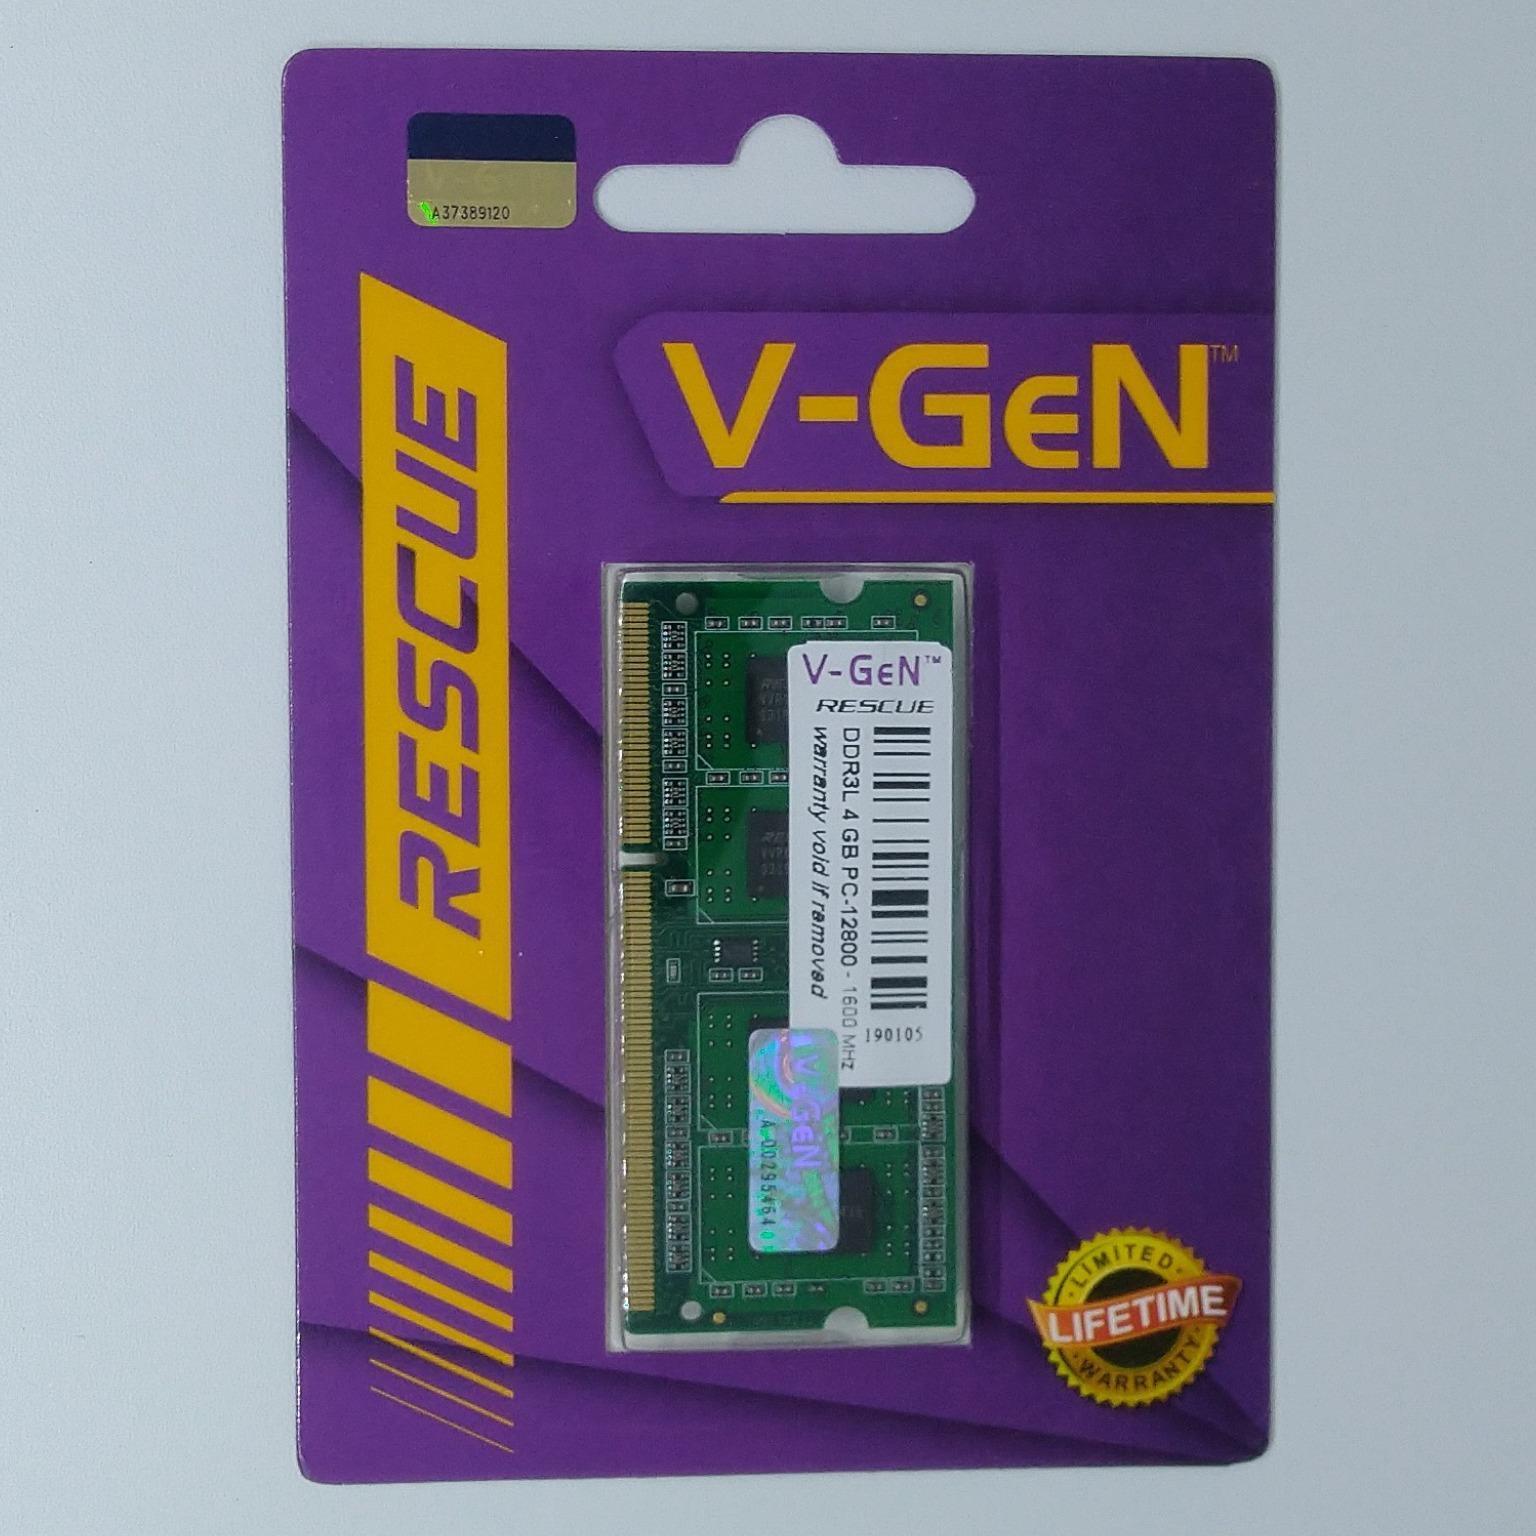 Ram Ddr3l Sodimm V-Gen Rescue 4gb Pc12800/1600mhz (memory Laptop Vgen) By Valkyre Online Shop.